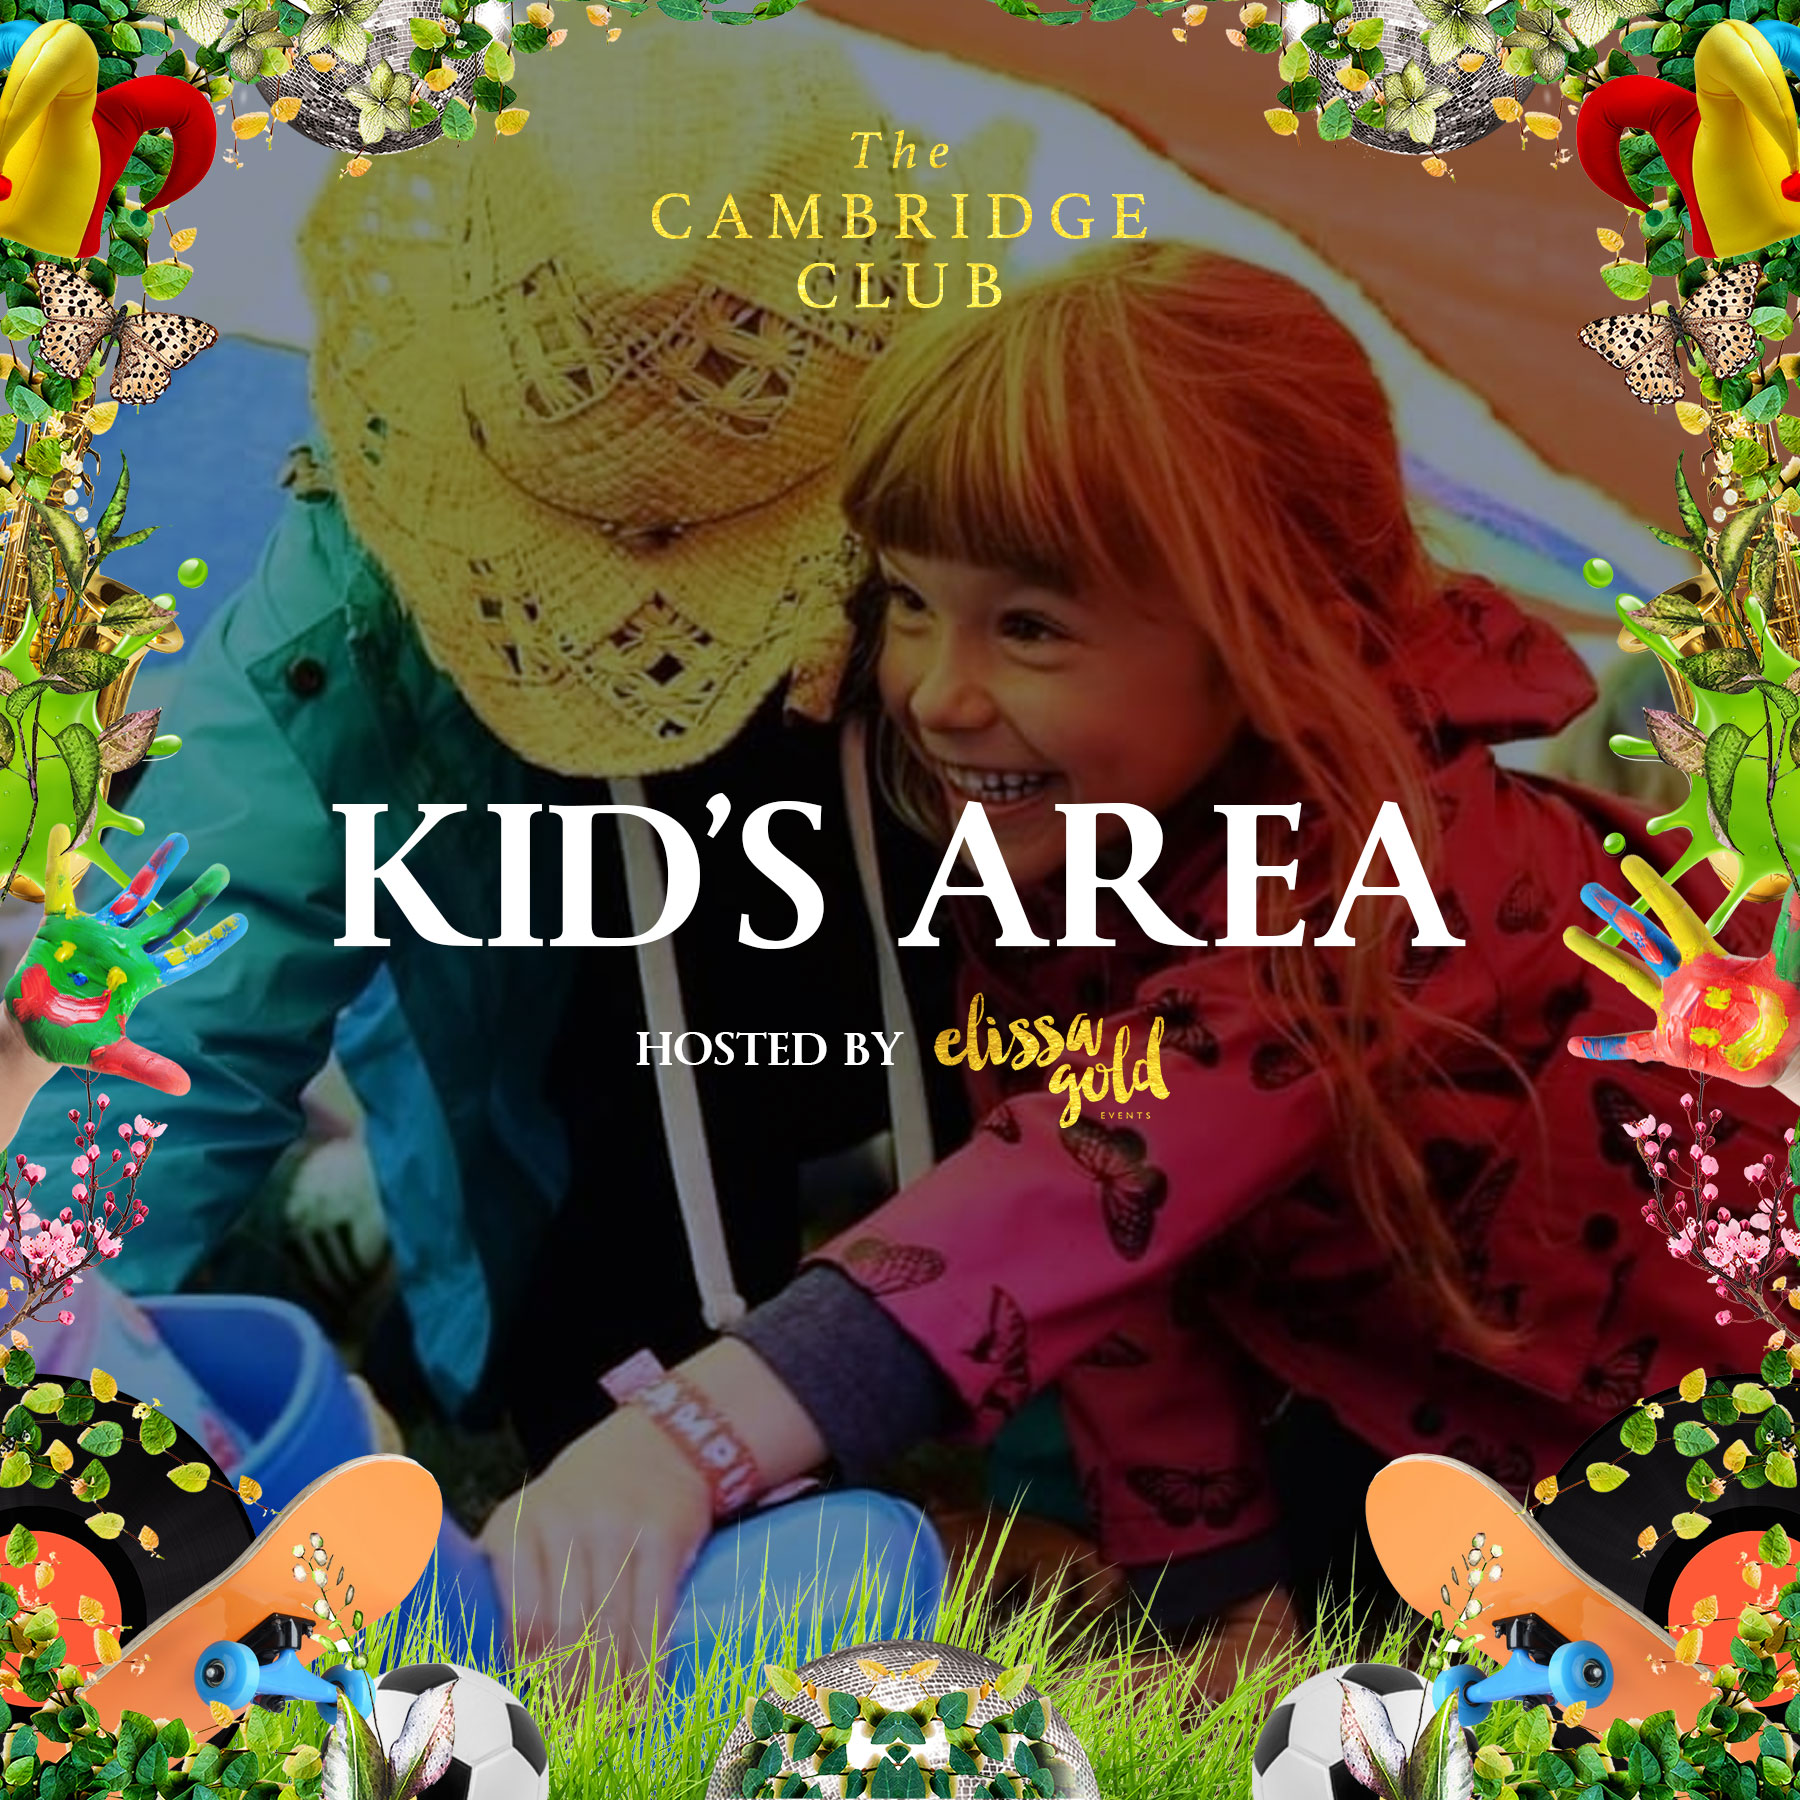 cc_2019_kids_sq2.jpg